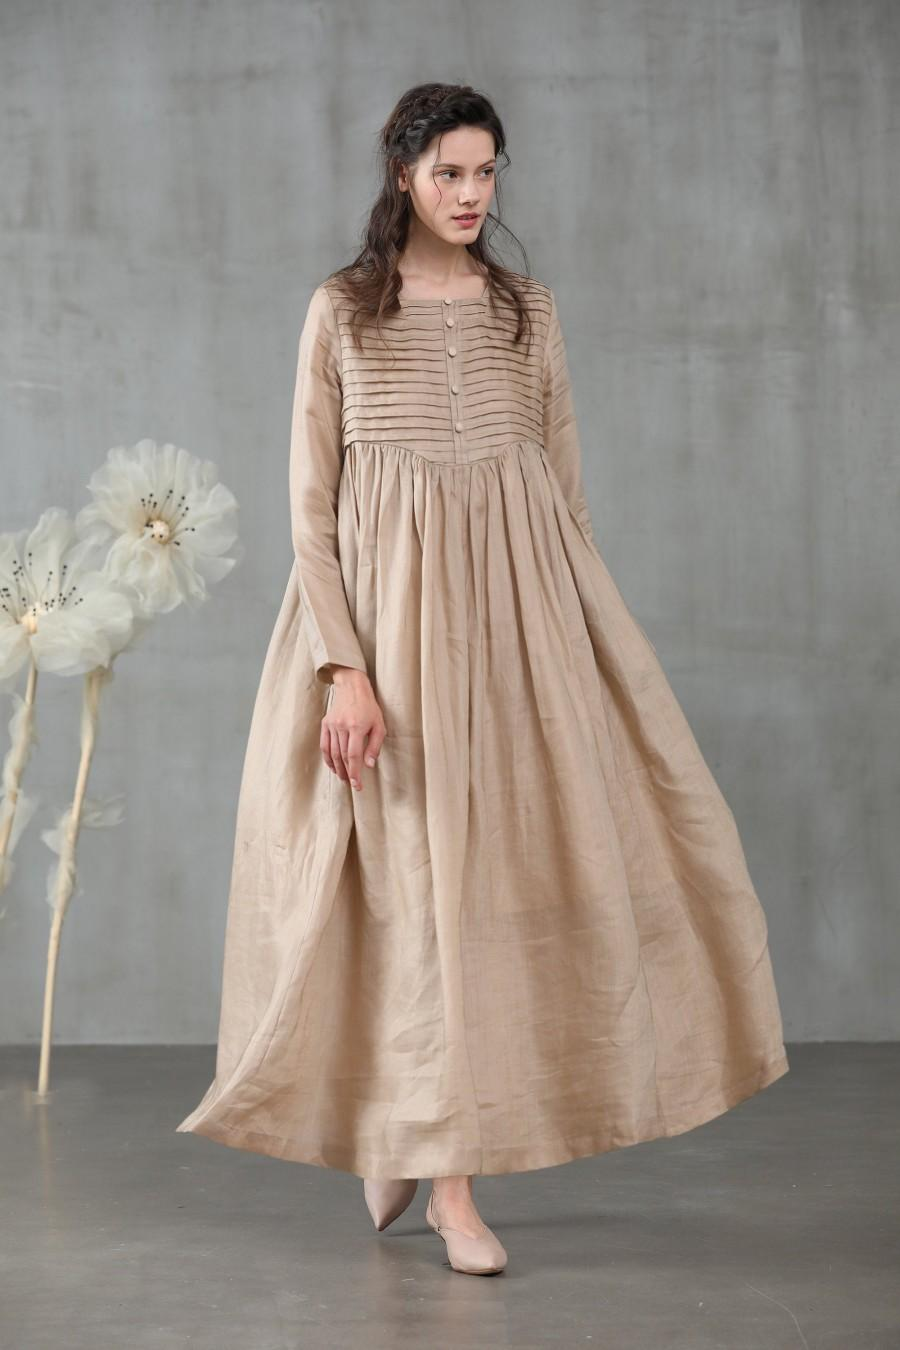 Linen Dress Maxi Dress In Champagne Winter Dress Pleated Dress Longsleeved Dress Wedding Dress French Dress 2946660 Weddbook,Wedding Guest Dresses For Chubby Ladies